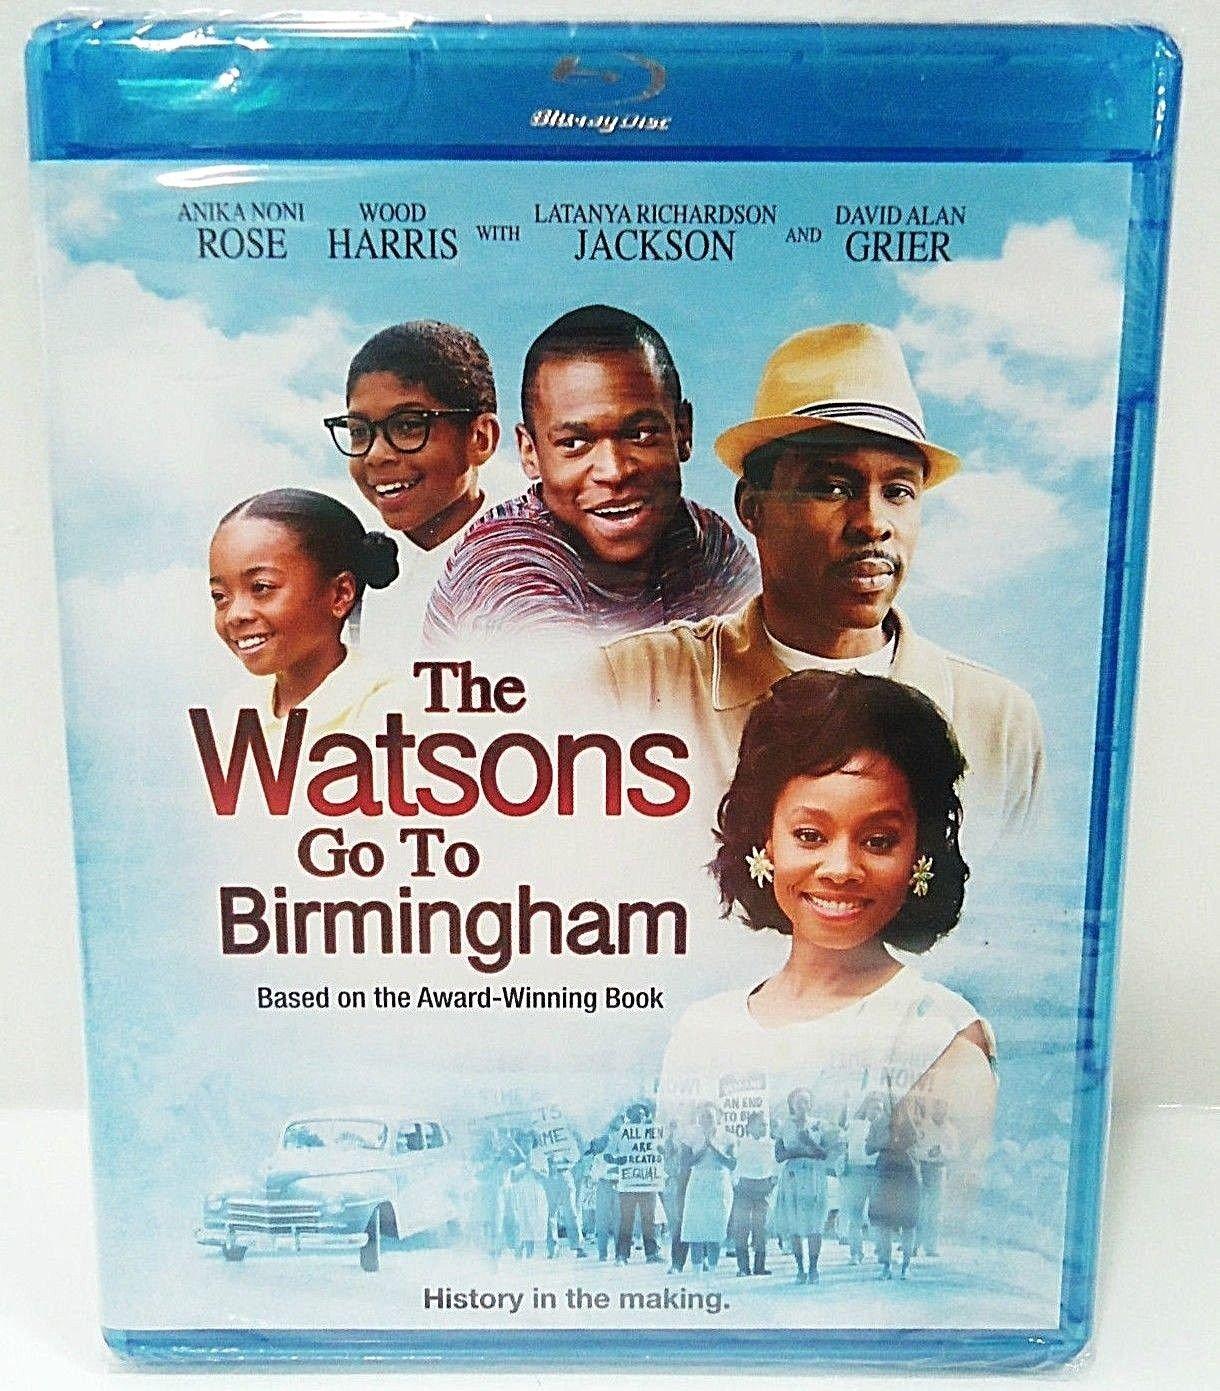 THE WATSONS GO TO BIRMINGHAM - DVD - BLU-RAY - DAVID ALAN GRIER - NEW - SELMA